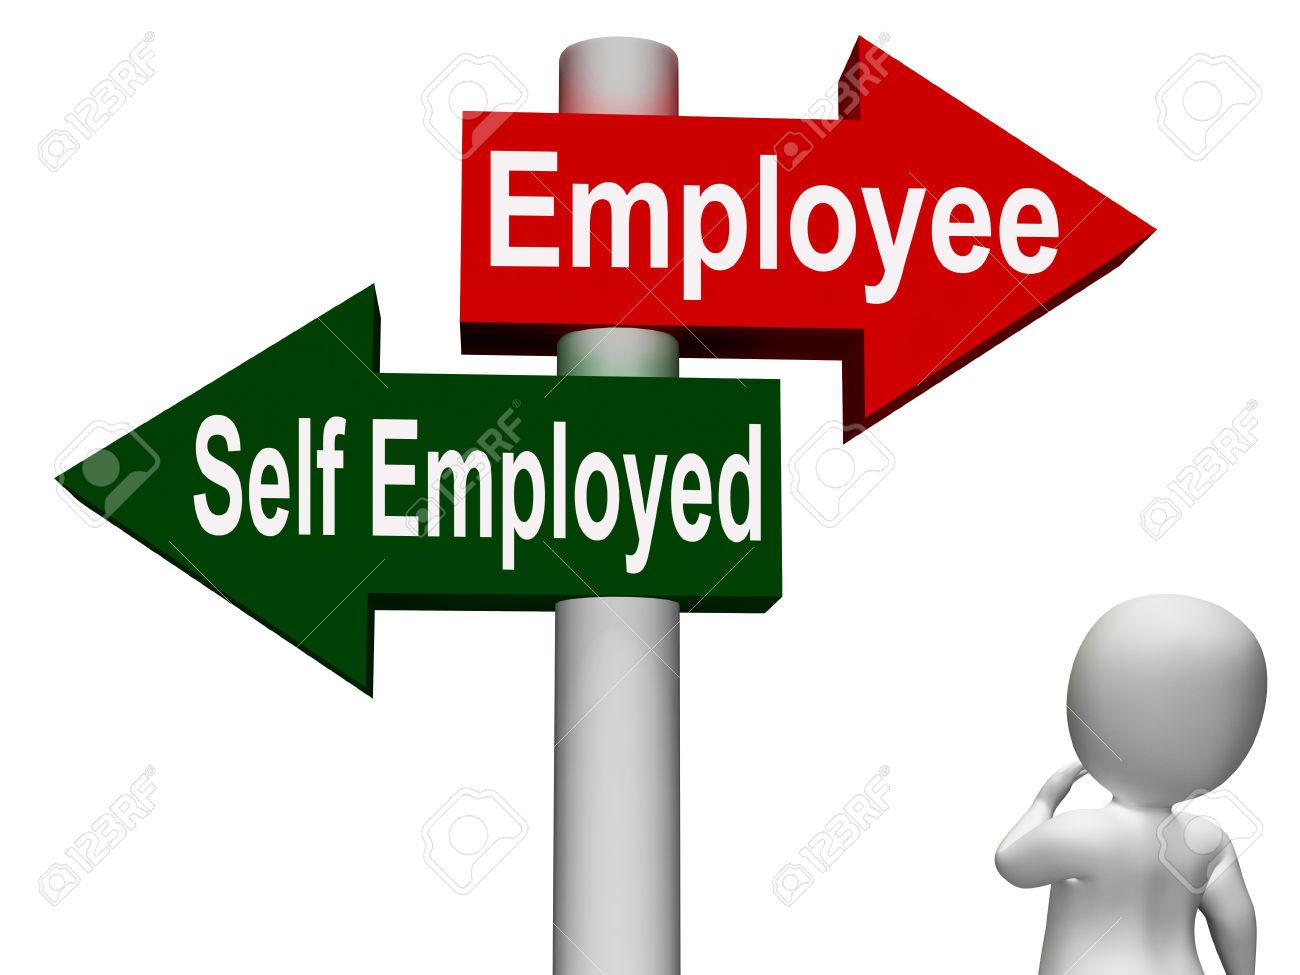 Employee Self Employed Signpost Meaning Choose Career Job Choice.